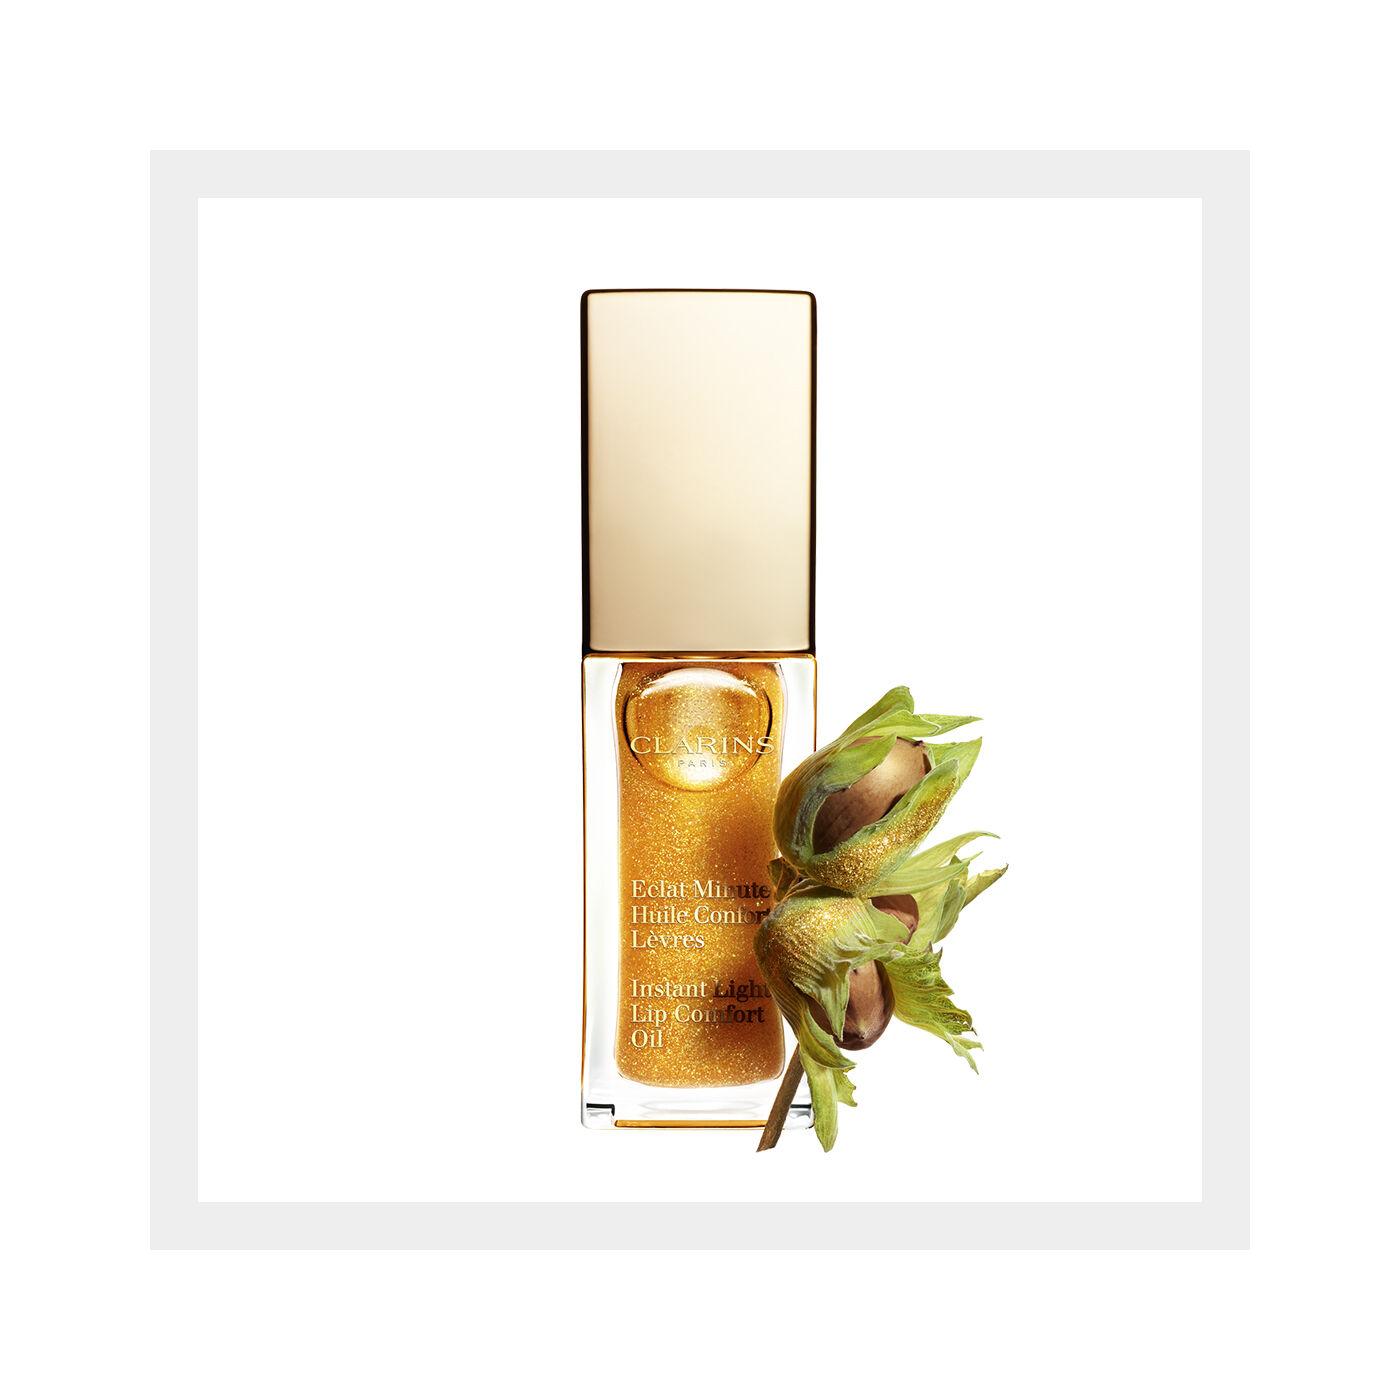 Lippenpflege-Öl Eclat Minute Huile Confort Lèvres